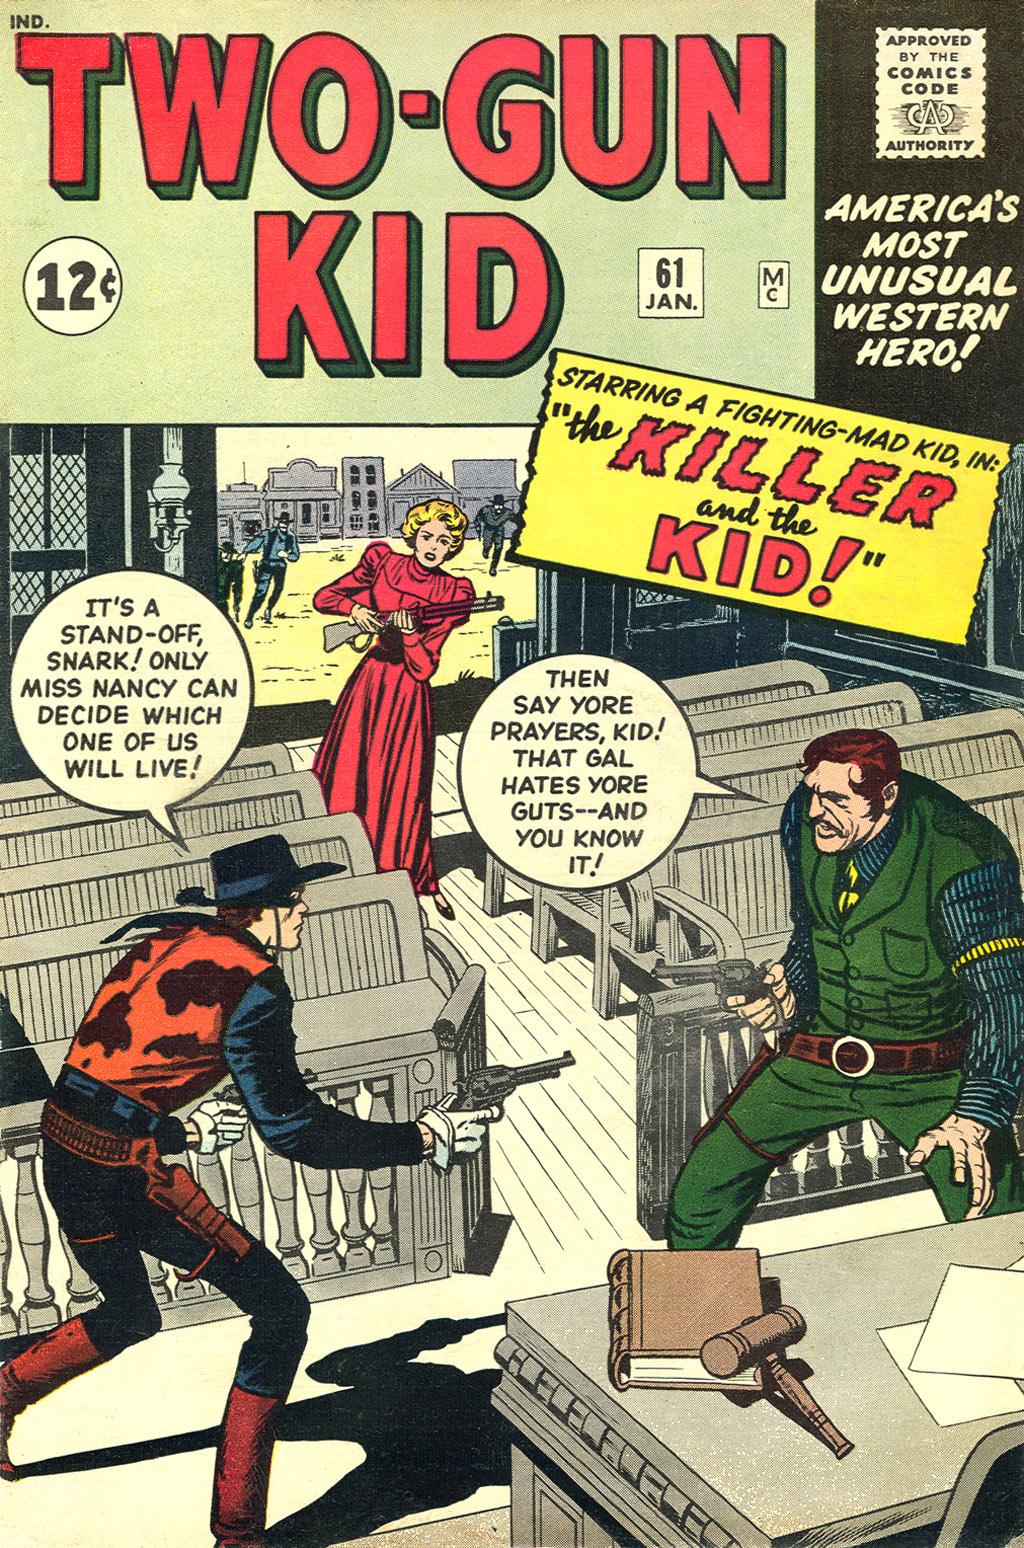 Read online Two-Gun Kid comic -  Issue #61 - 1